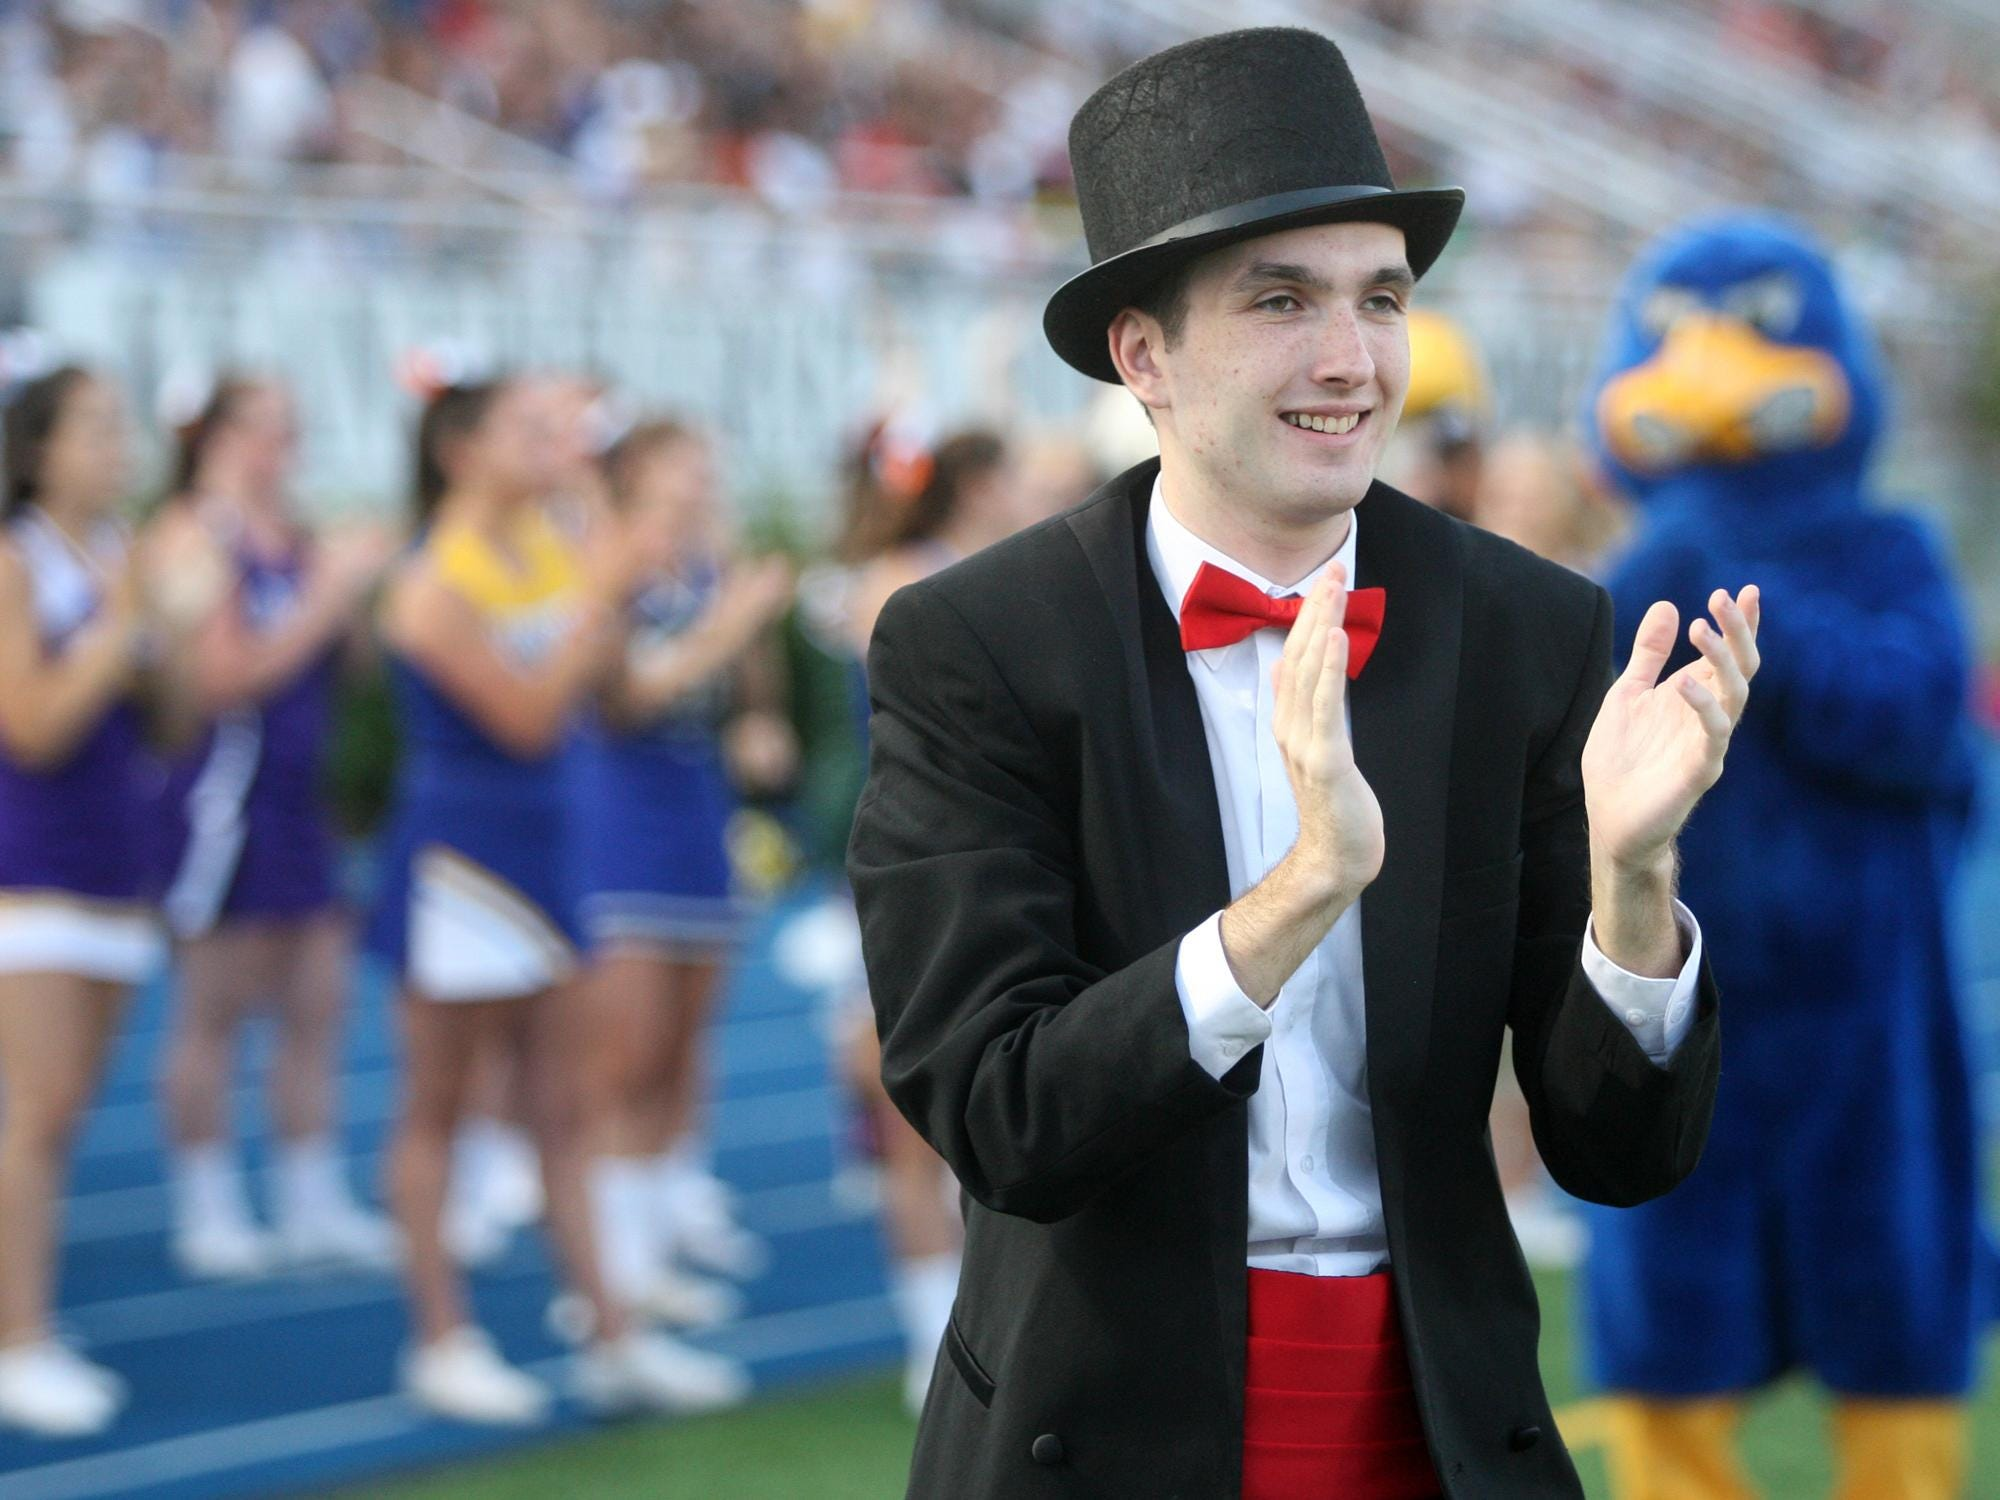 Woodbridge Barrons mascot Johnathon O'Halloran celebrates a Middlesex touchdown Thursday during Snapple Bowl XXII at Kean University in Union.